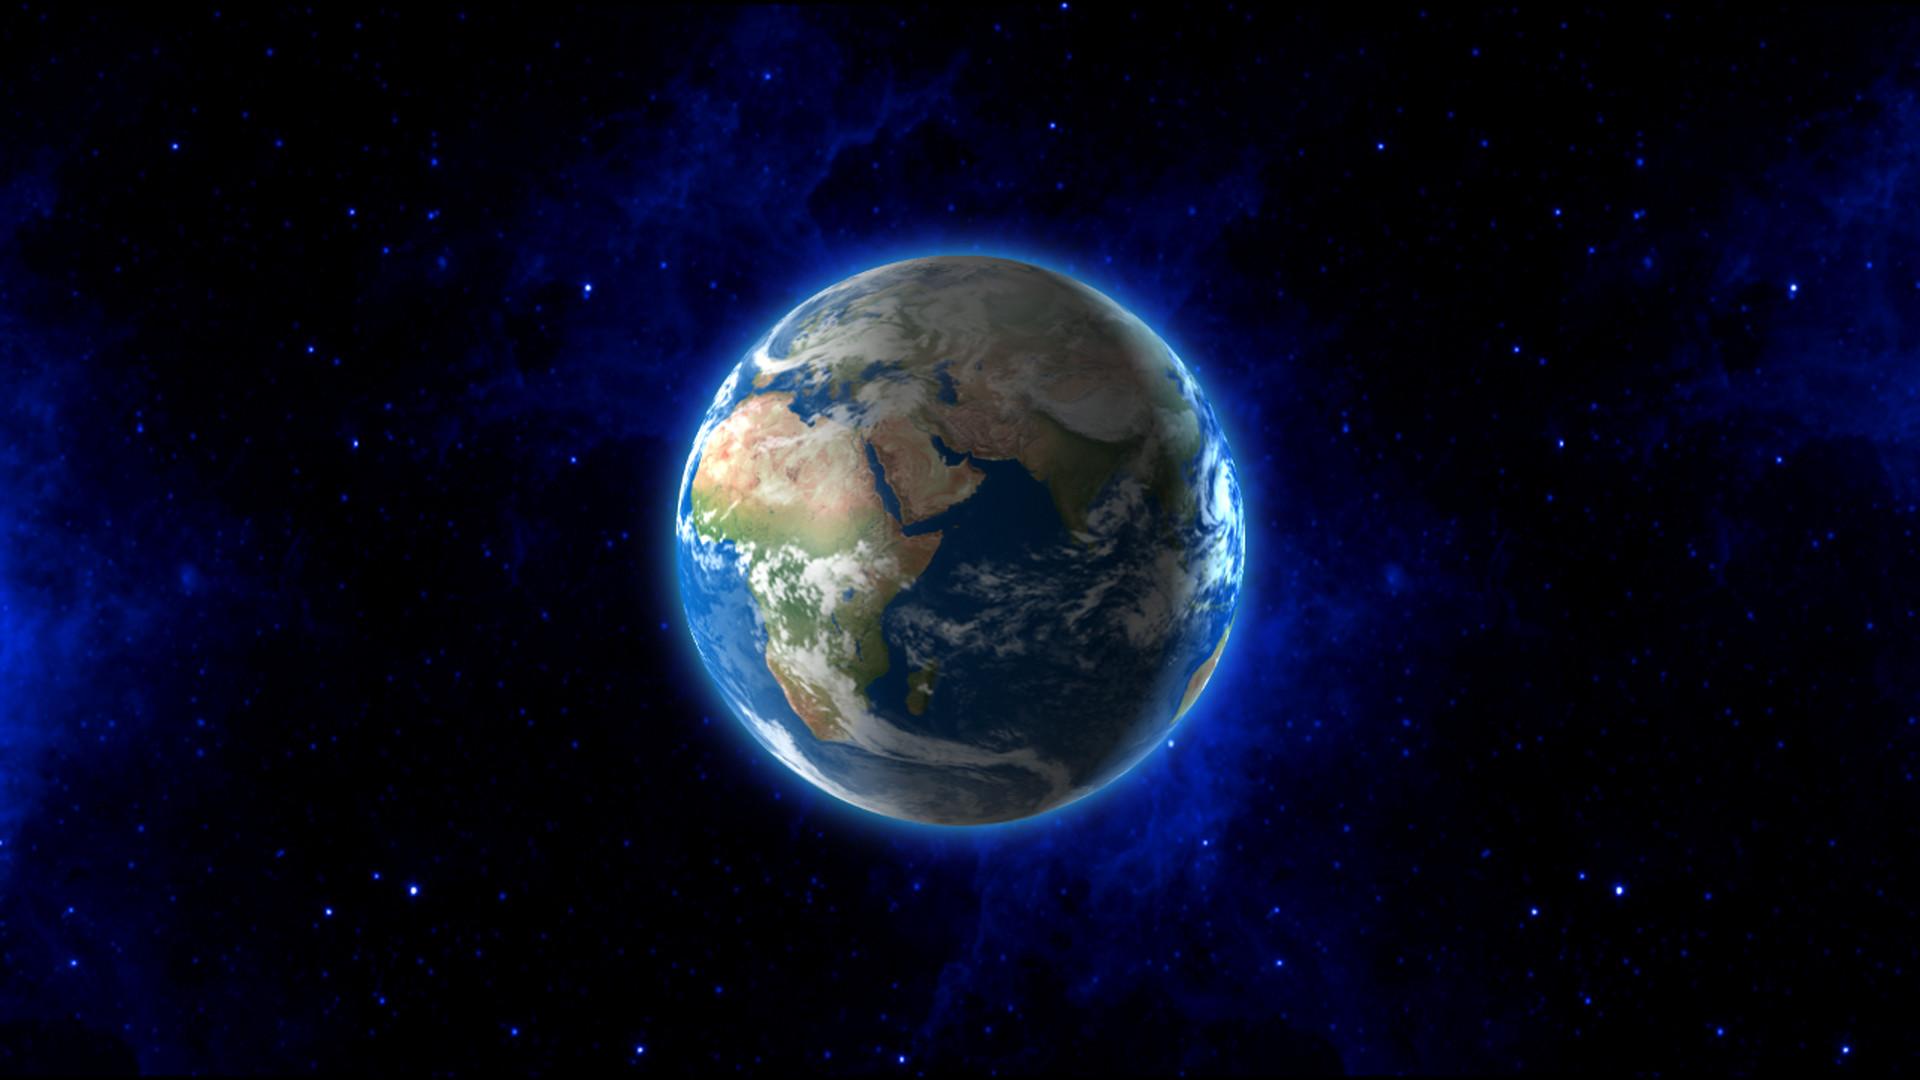 Explore - Windows 10 Wallpaper Earth , HD Wallpaper & Backgrounds